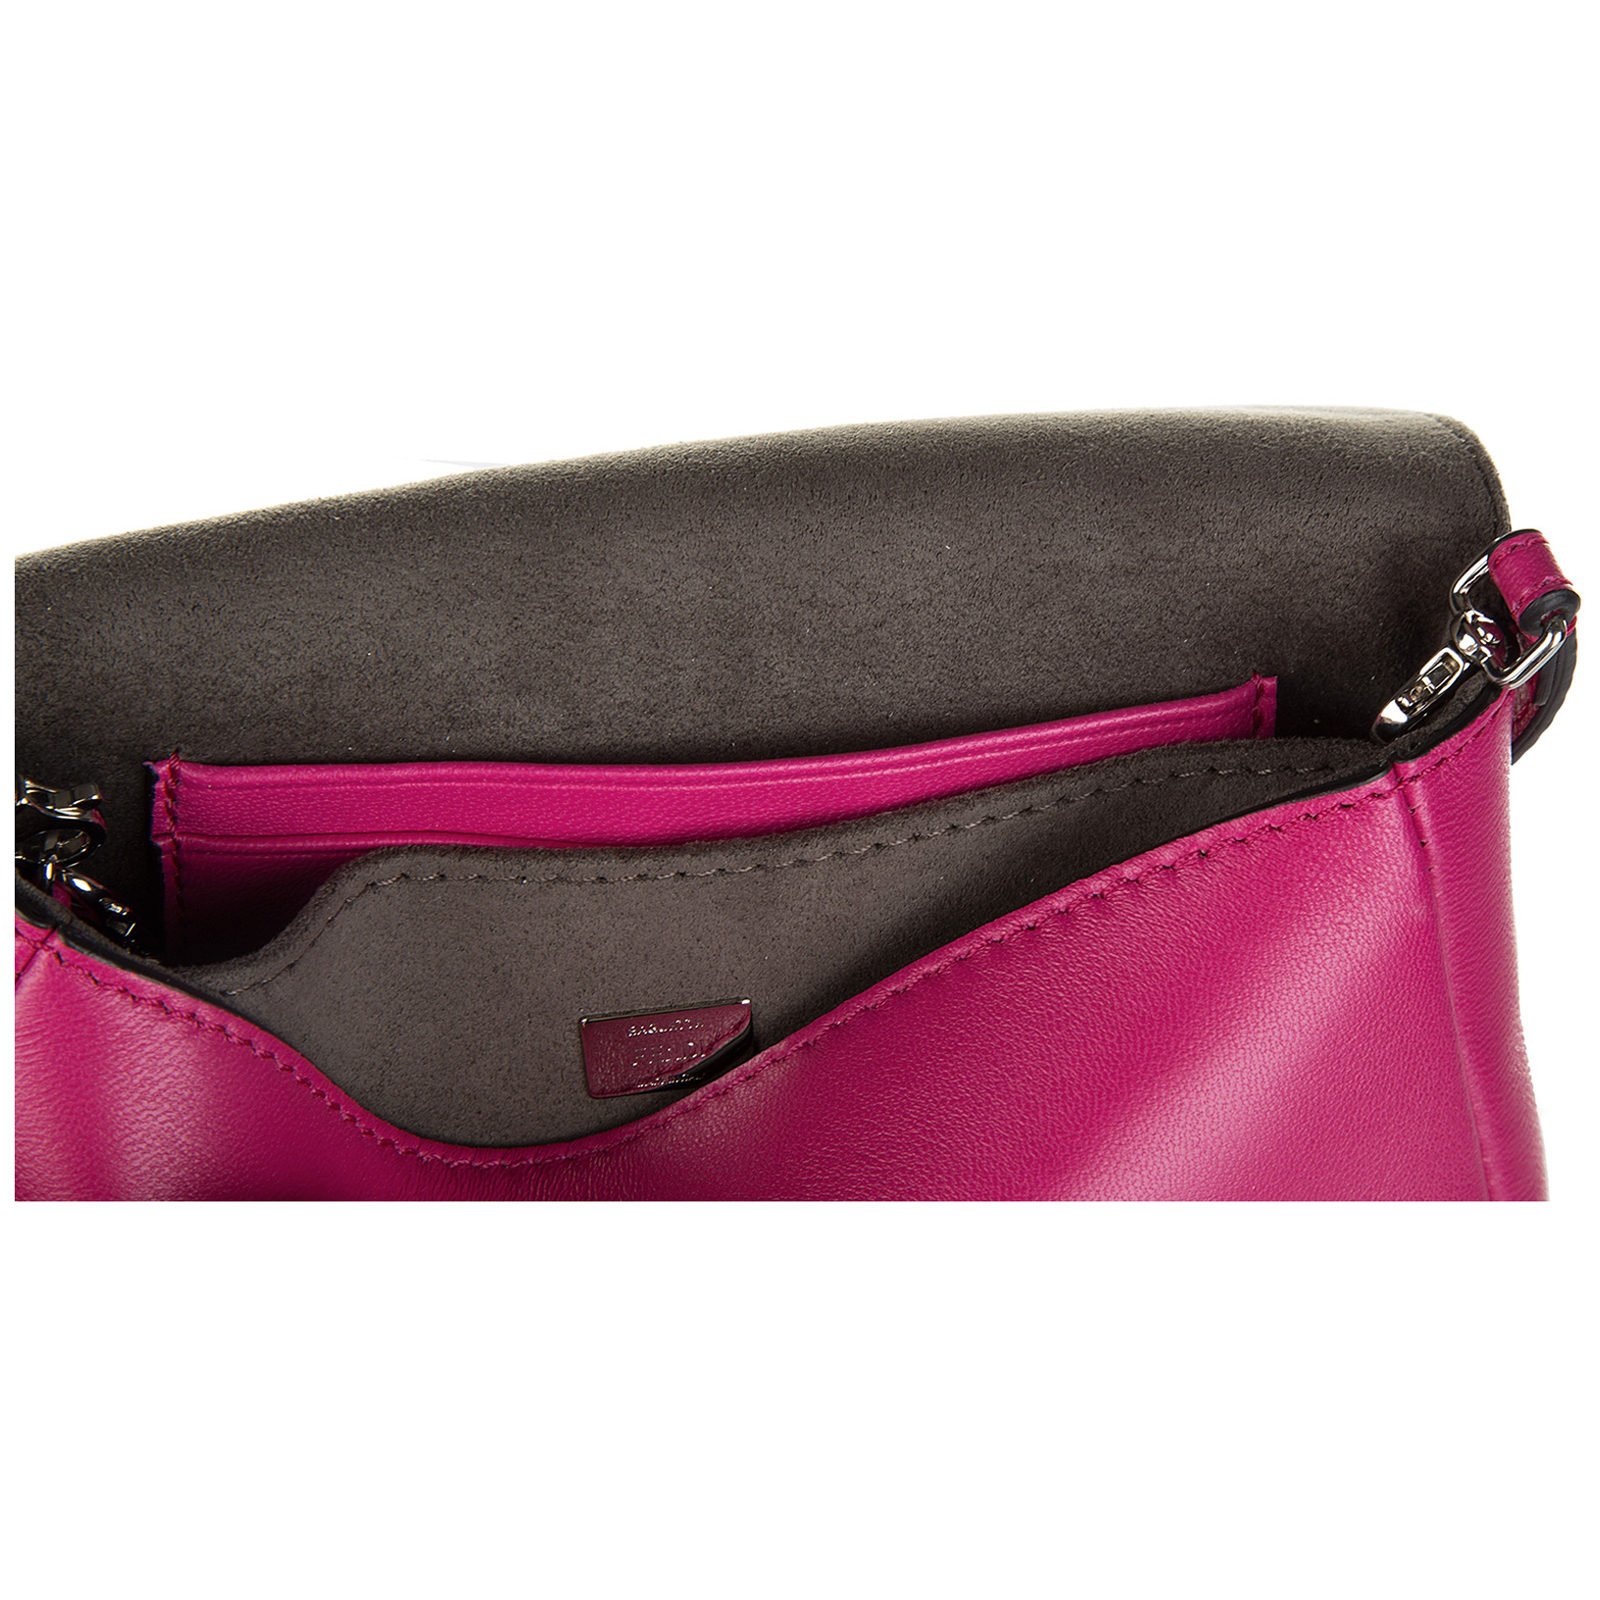 Women's leather shoulder bag micro baguette